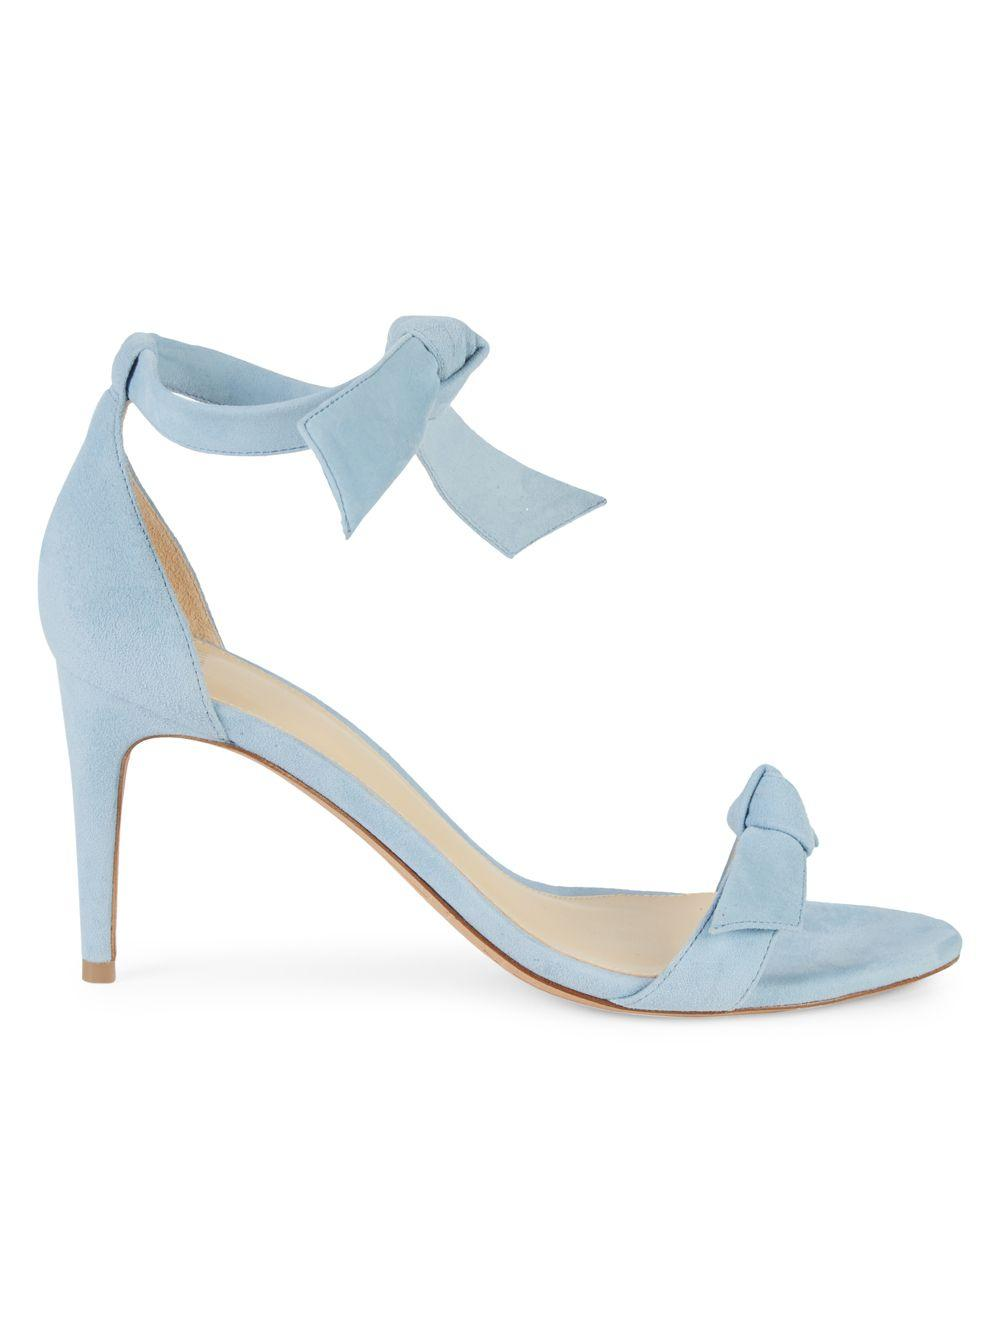 42171749e4b Lyst - Alexandre Birman Clarita Suede Tie Sandals in Blue